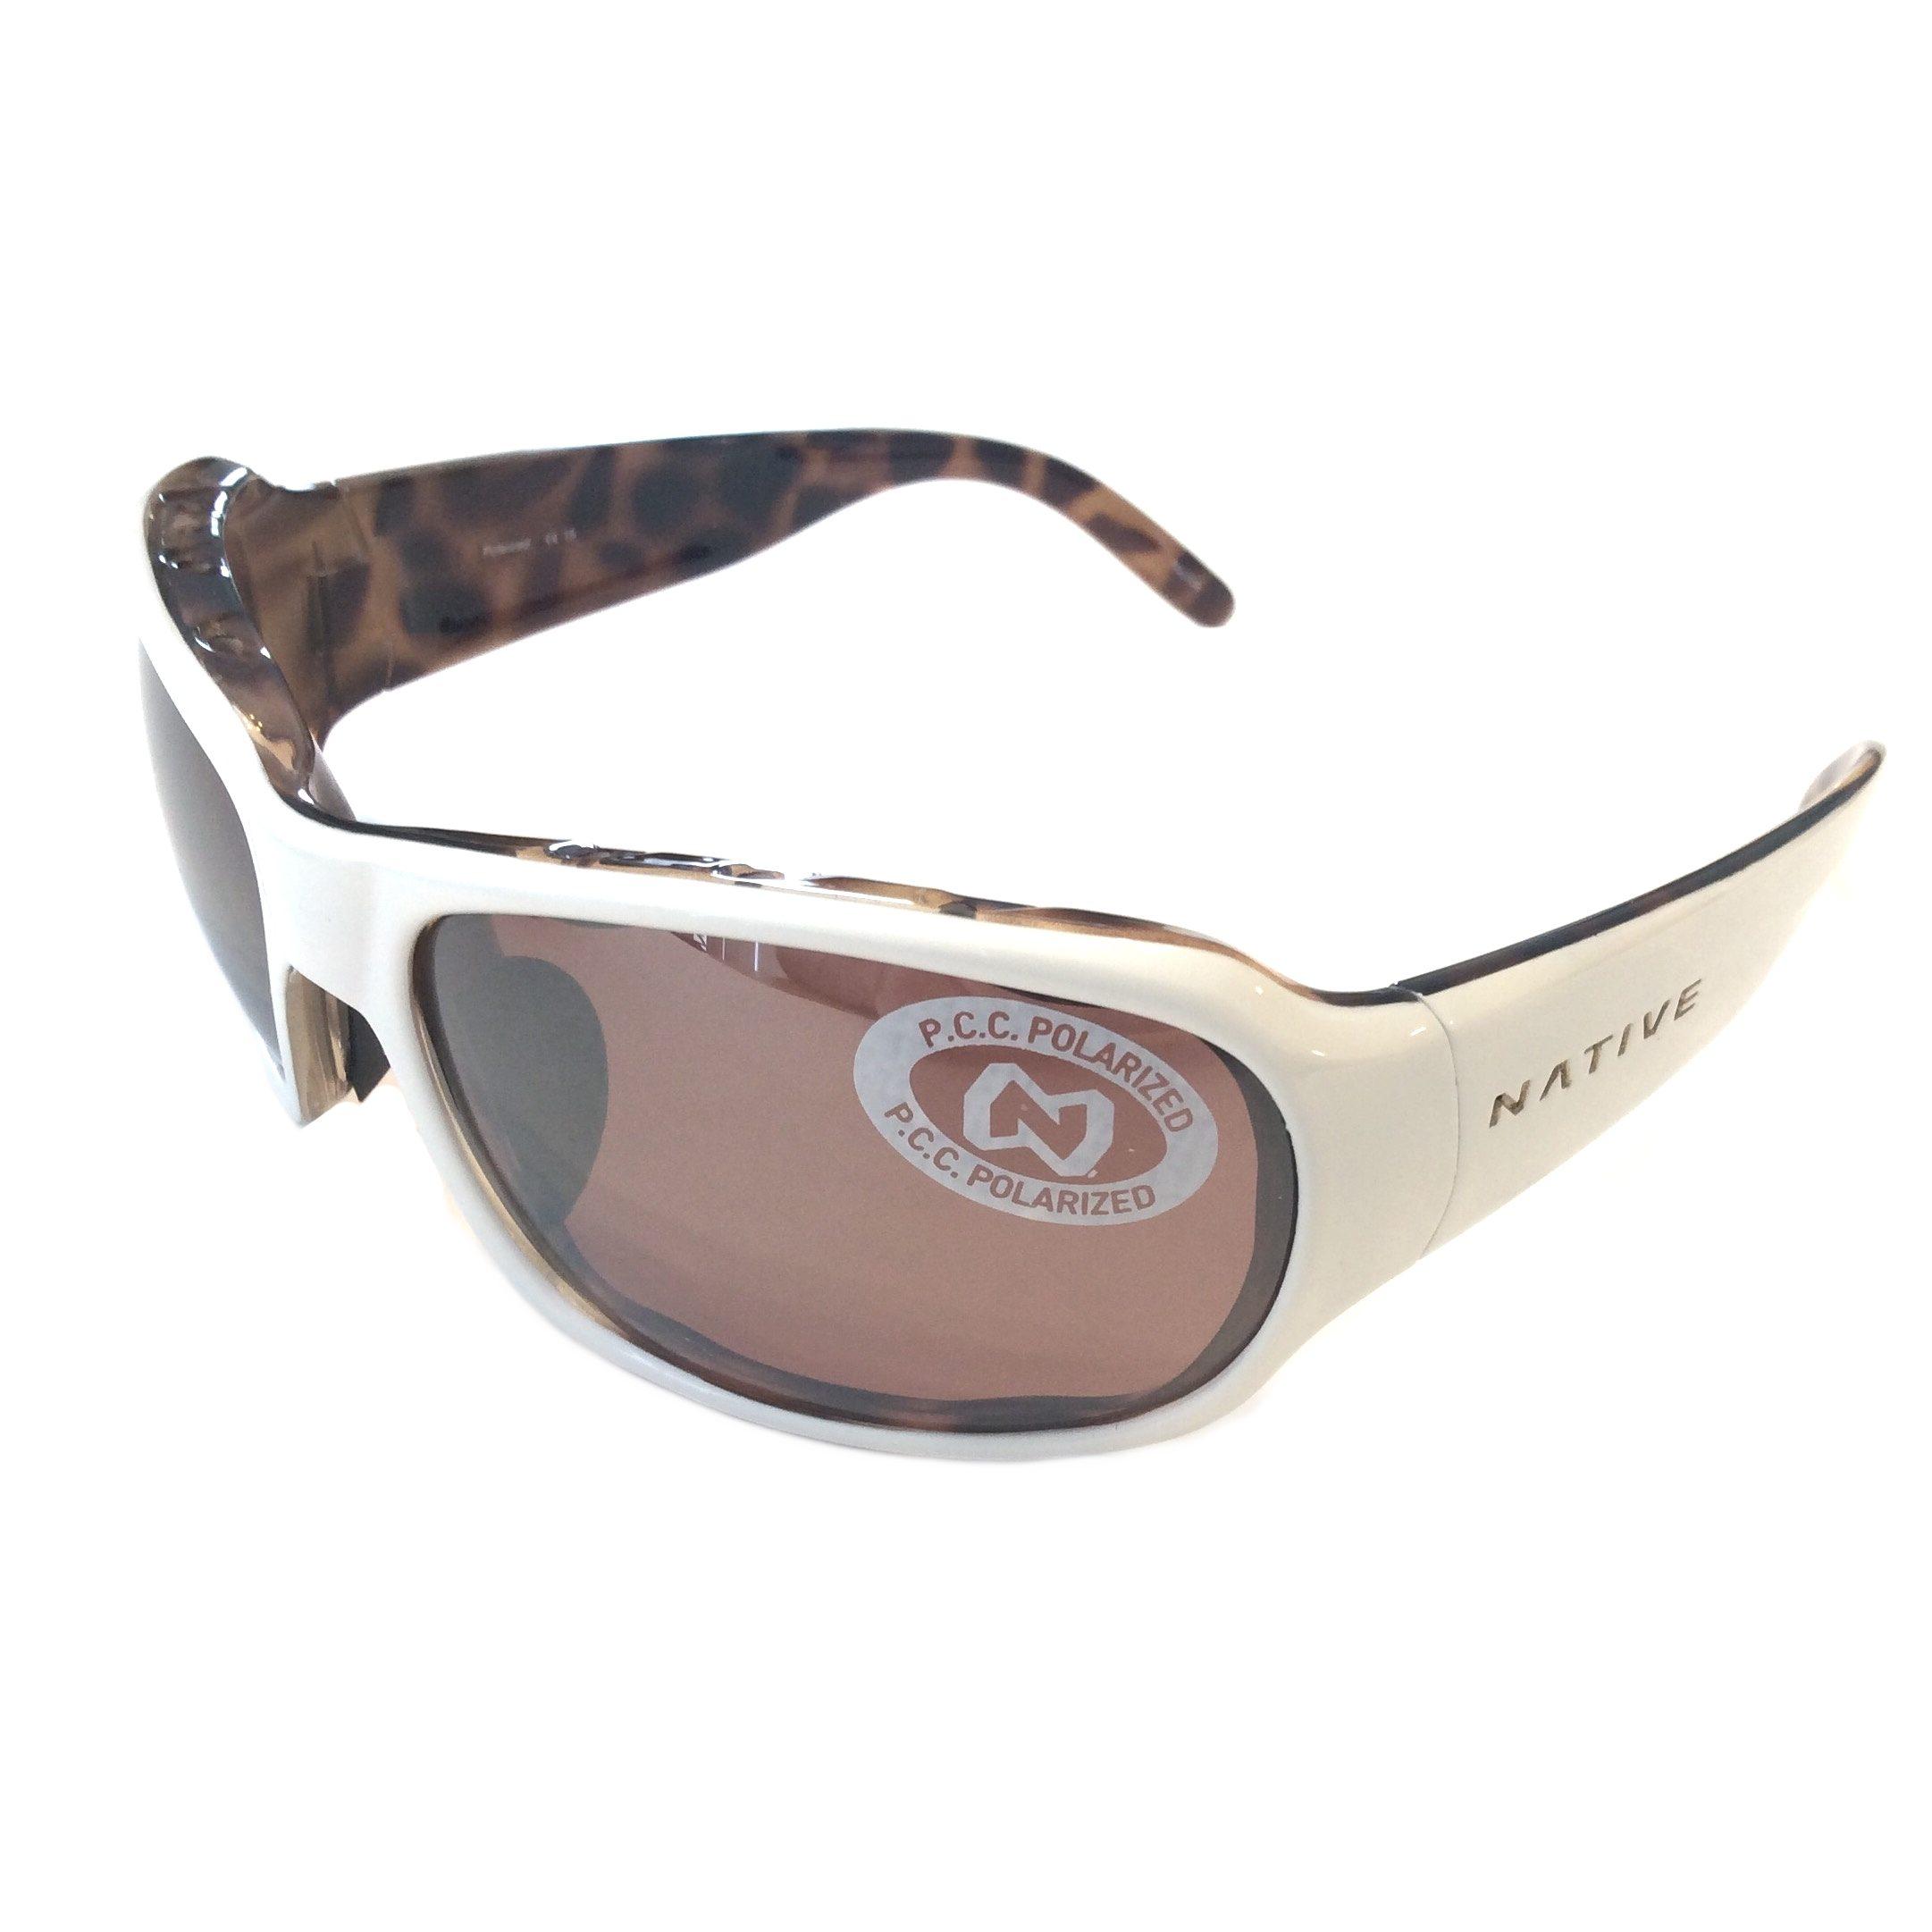 51e7ef631c866 Native Eyewear Solo Sunglasses – Sahara White Frame – Polarized ...